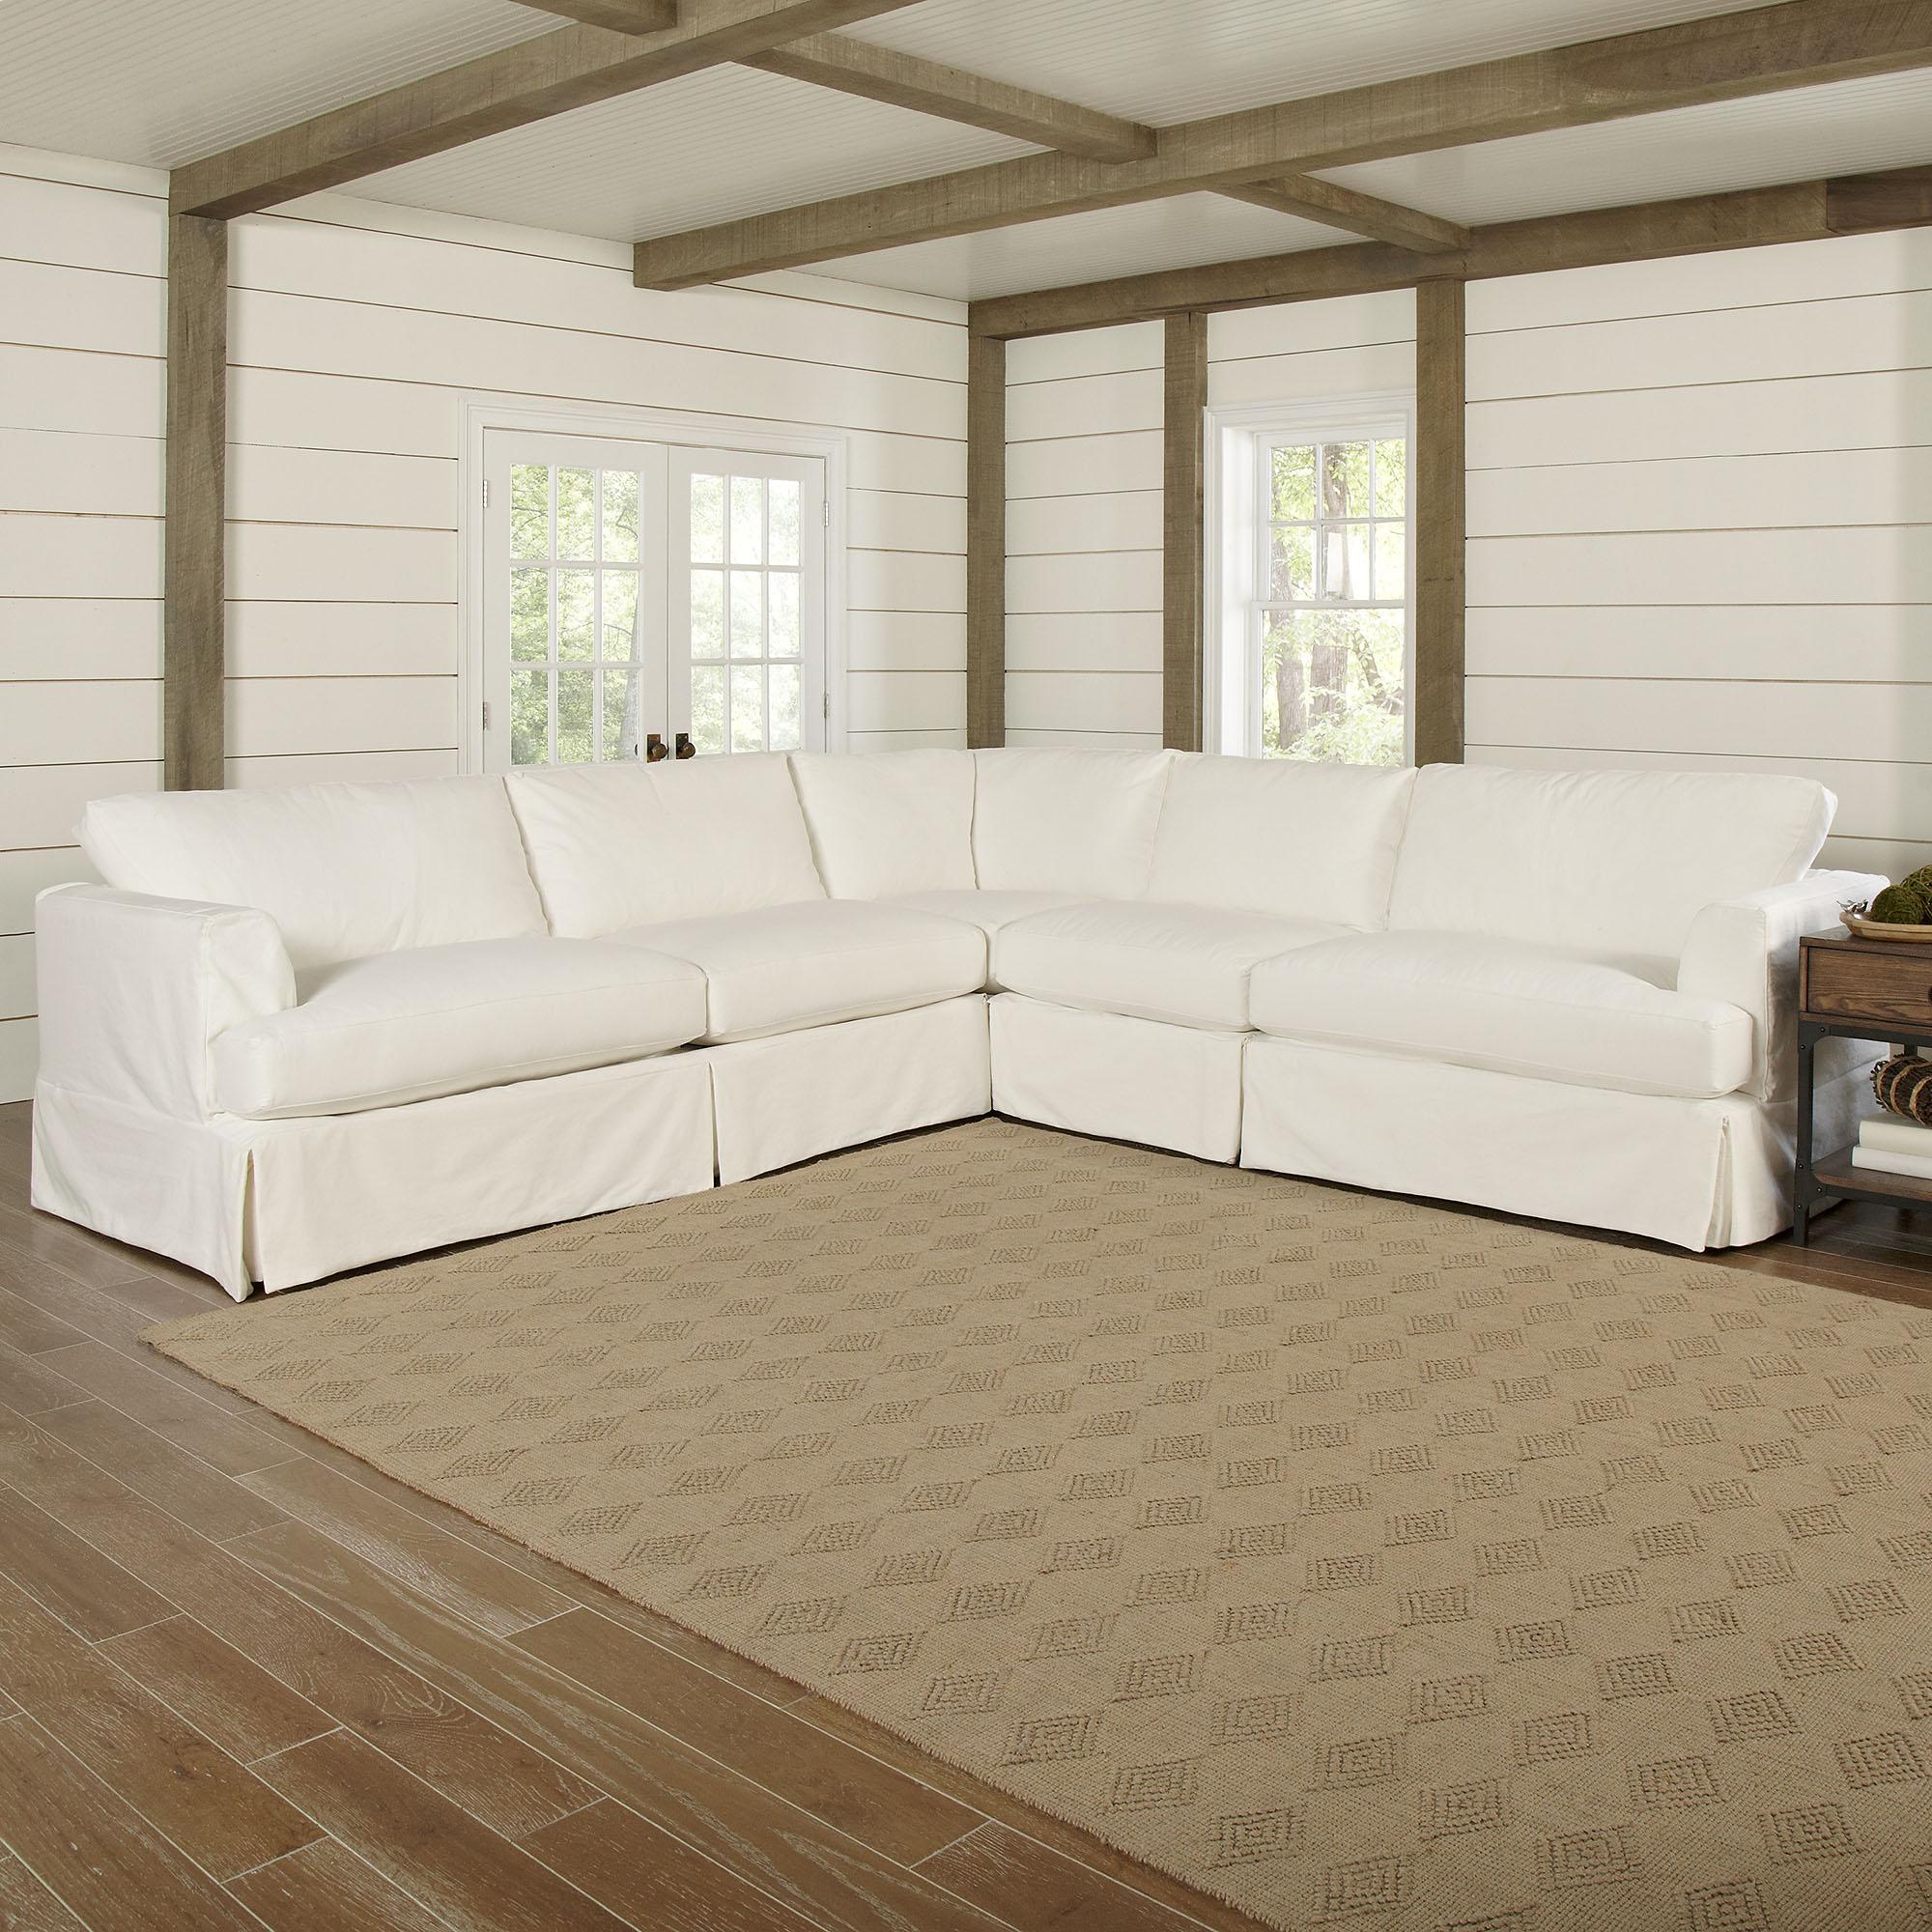 Tremendous Farmhouse Rustic Custom Upholstery Birch Lane Machost Co Dining Chair Design Ideas Machostcouk